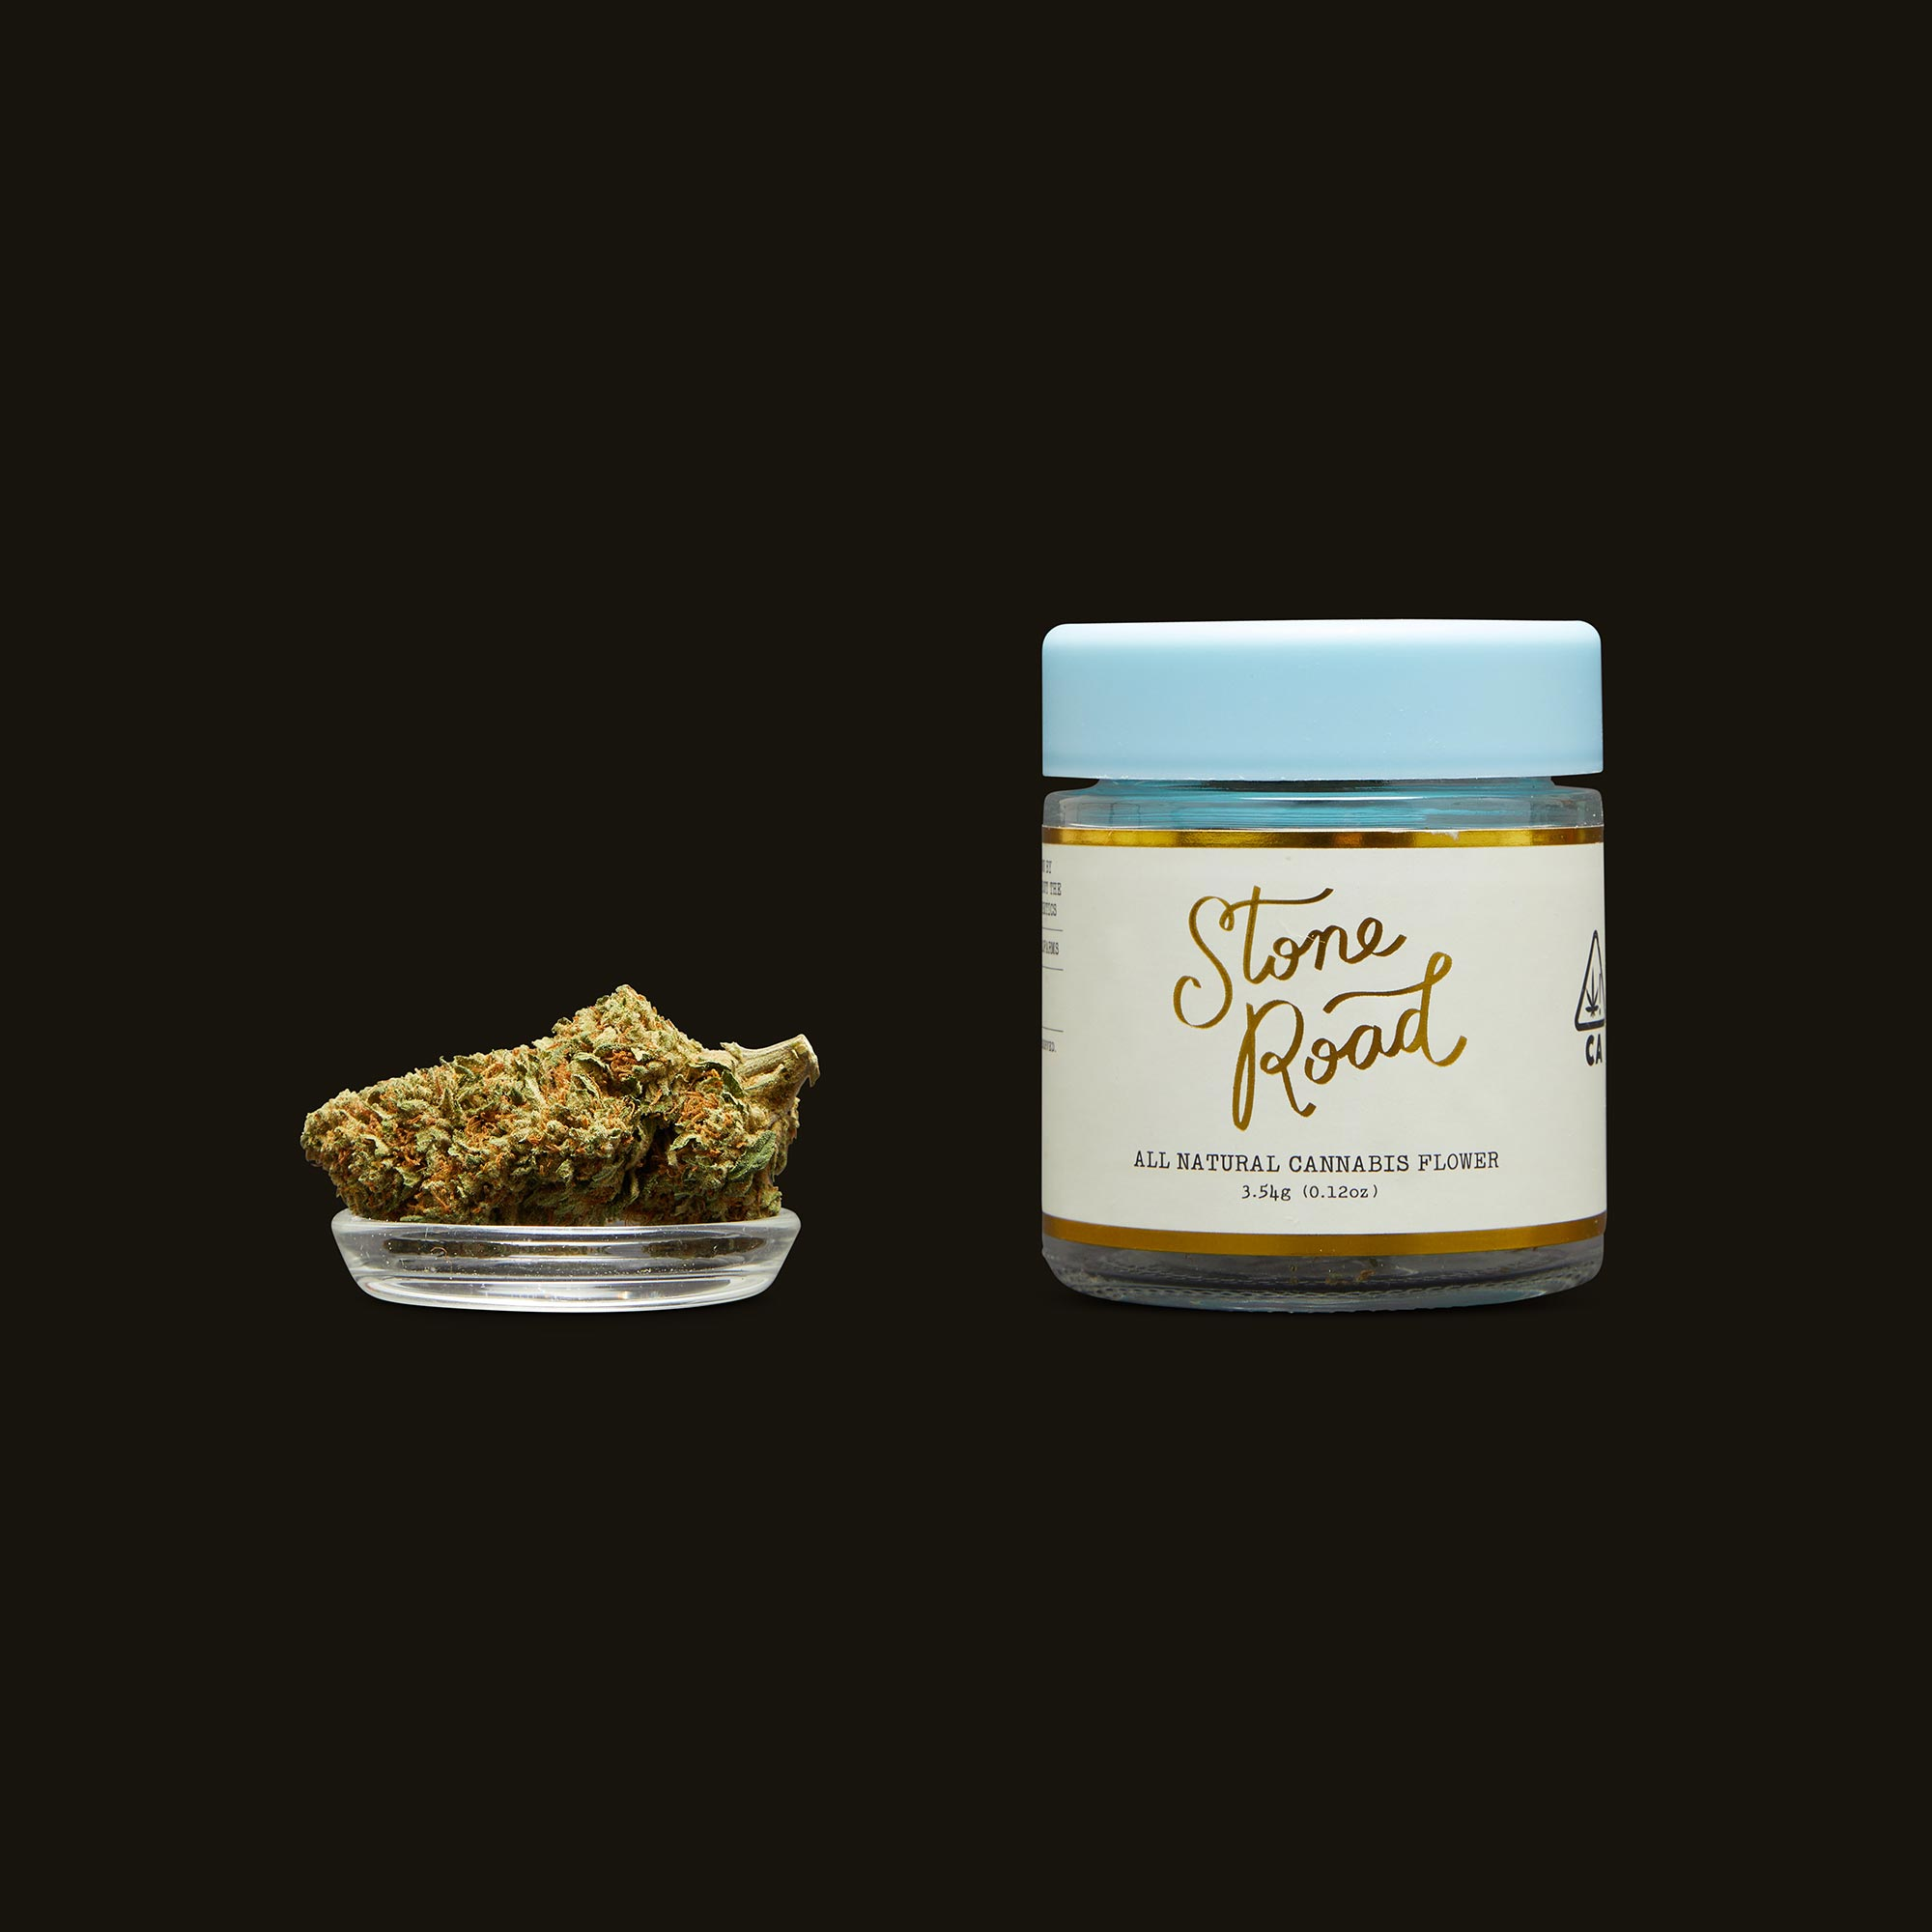 Stone Road Cookies